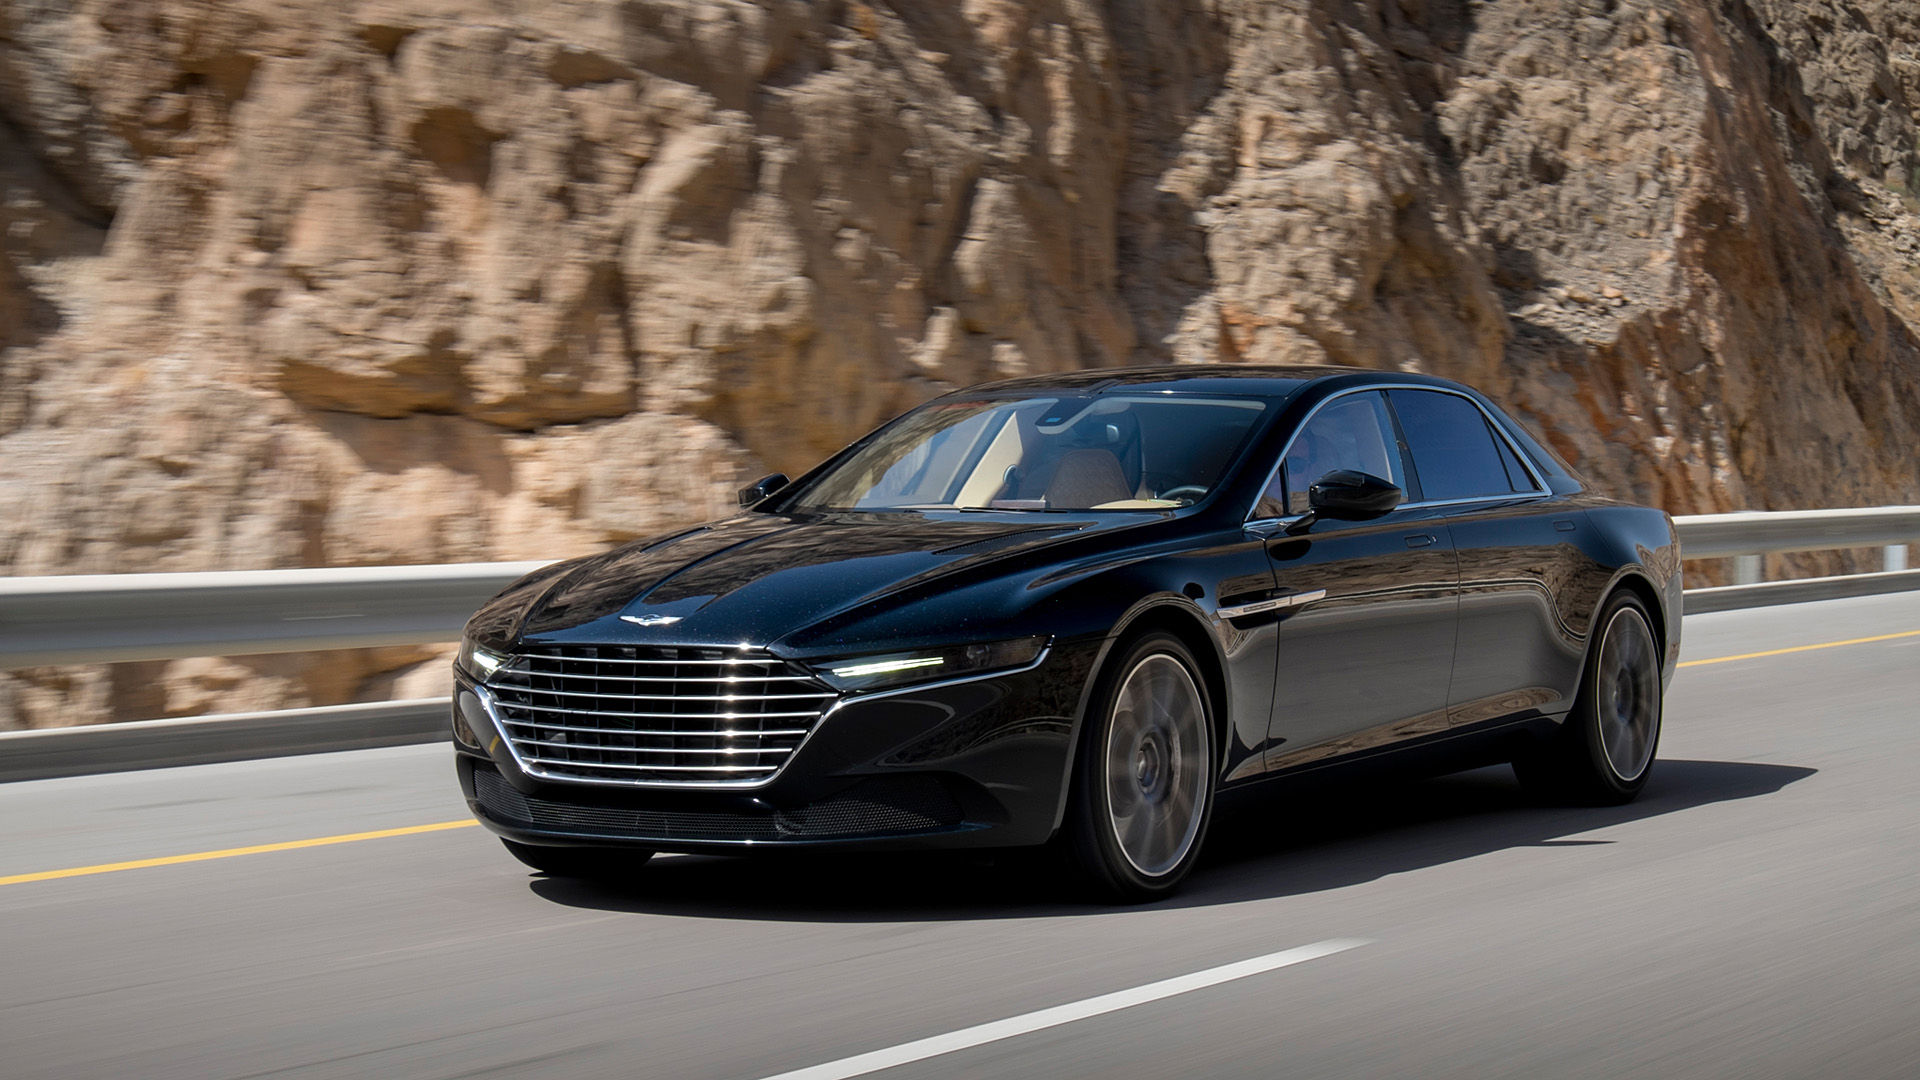 2014 Aston Martin Lagonda Prototype